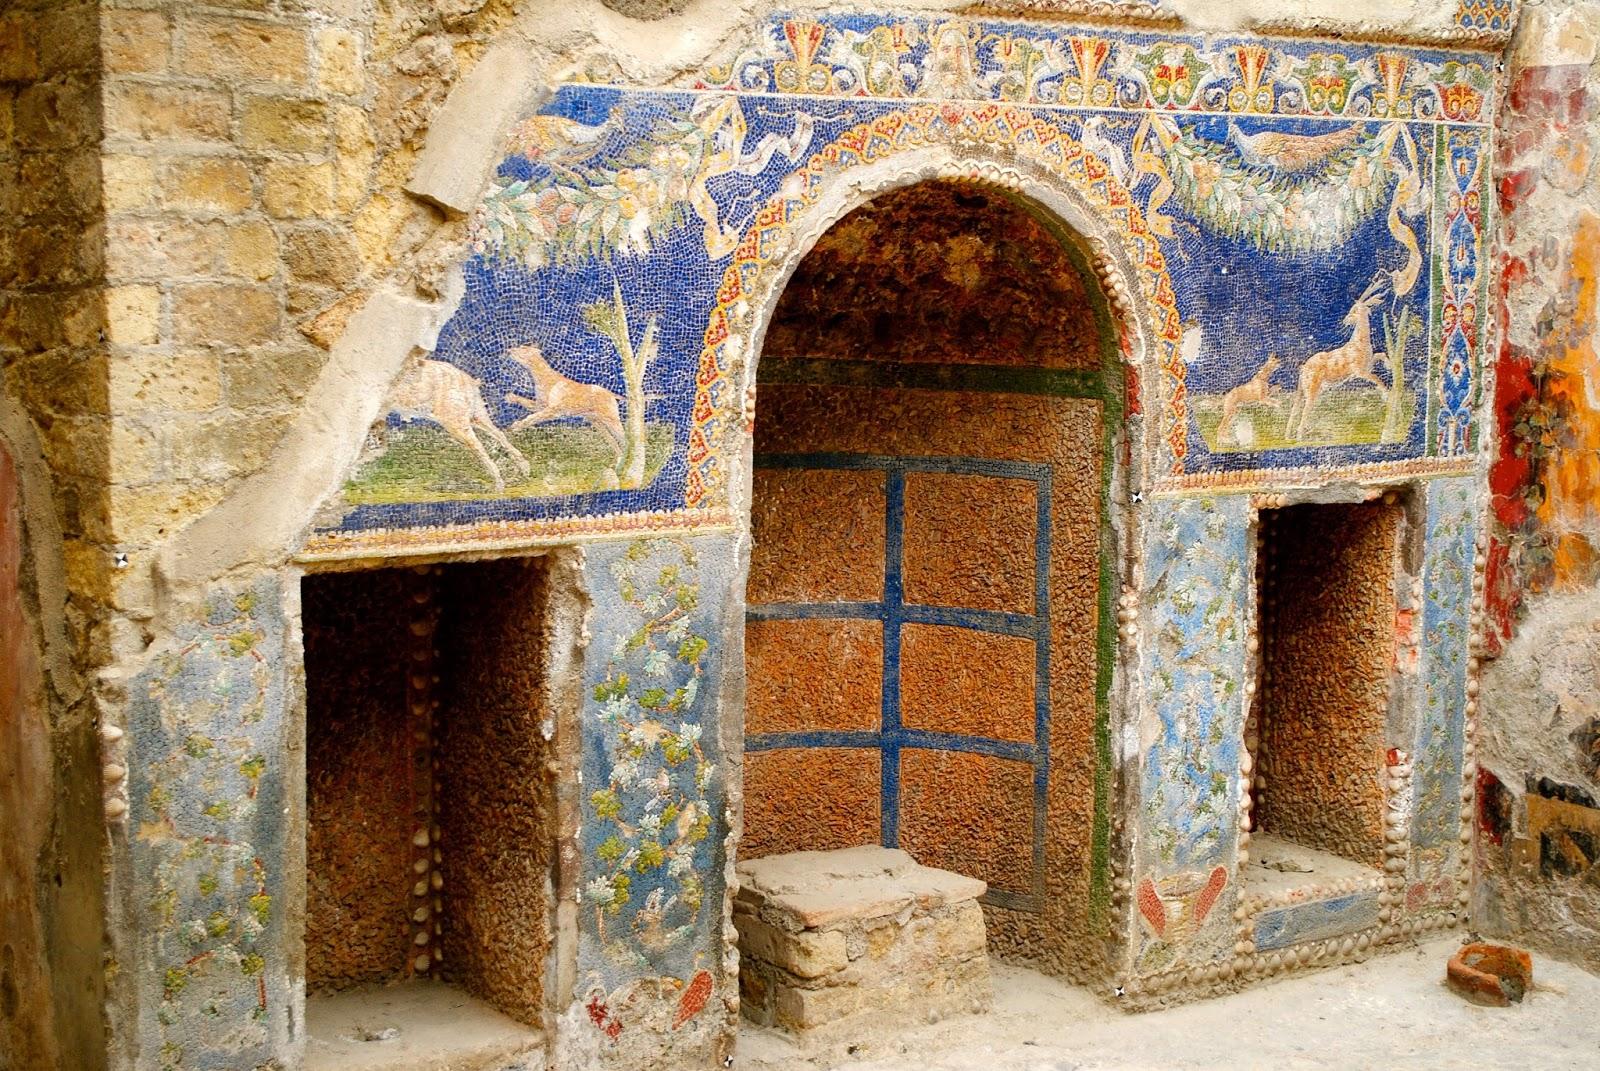 Mosaics in Herculaneum in Italy